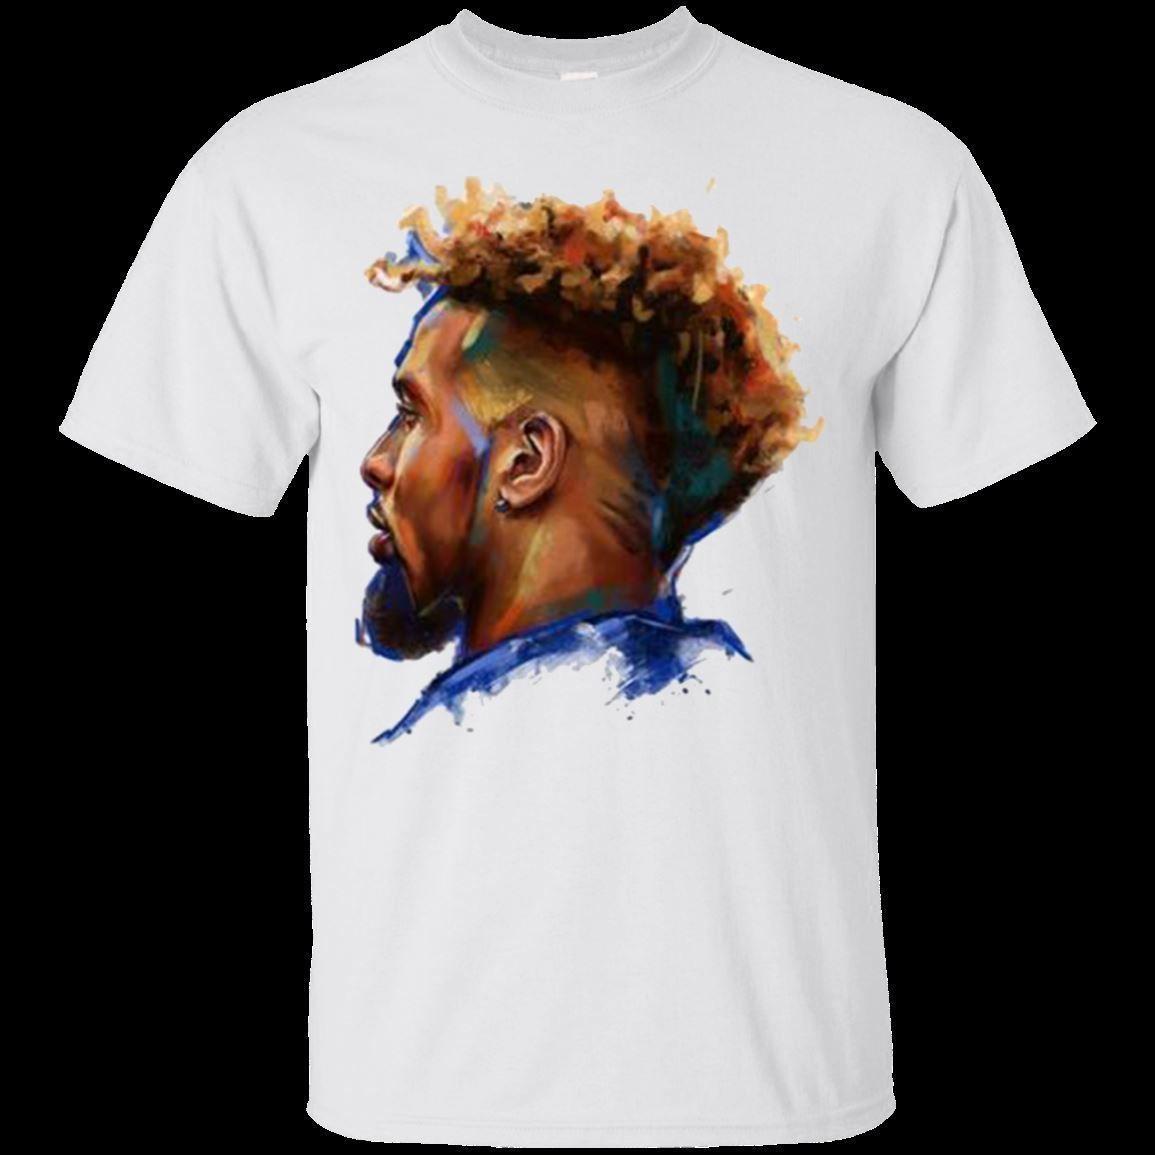 promo code 8fdaa c6597 Odell Beckham Jr. New York Giants T-shirt OBJ Face Men's Shirt Short Sleeve  Funny free shipping Unisex Casual tee gift top